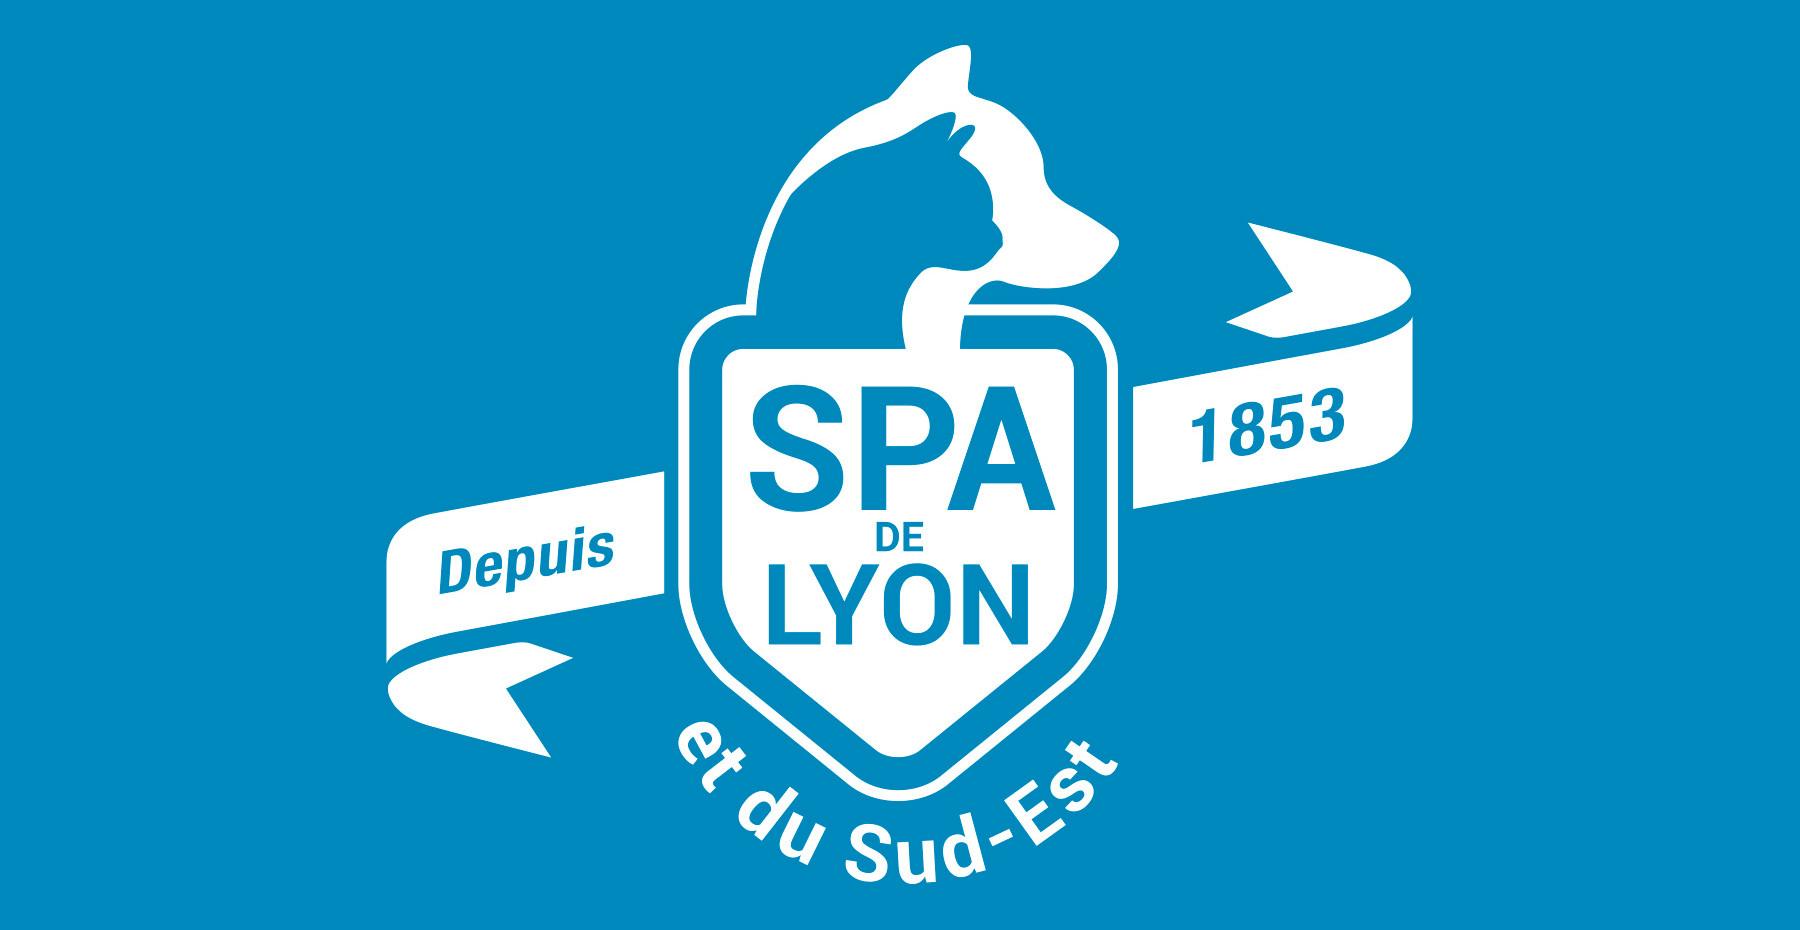 SPA_logo1_web.jpg